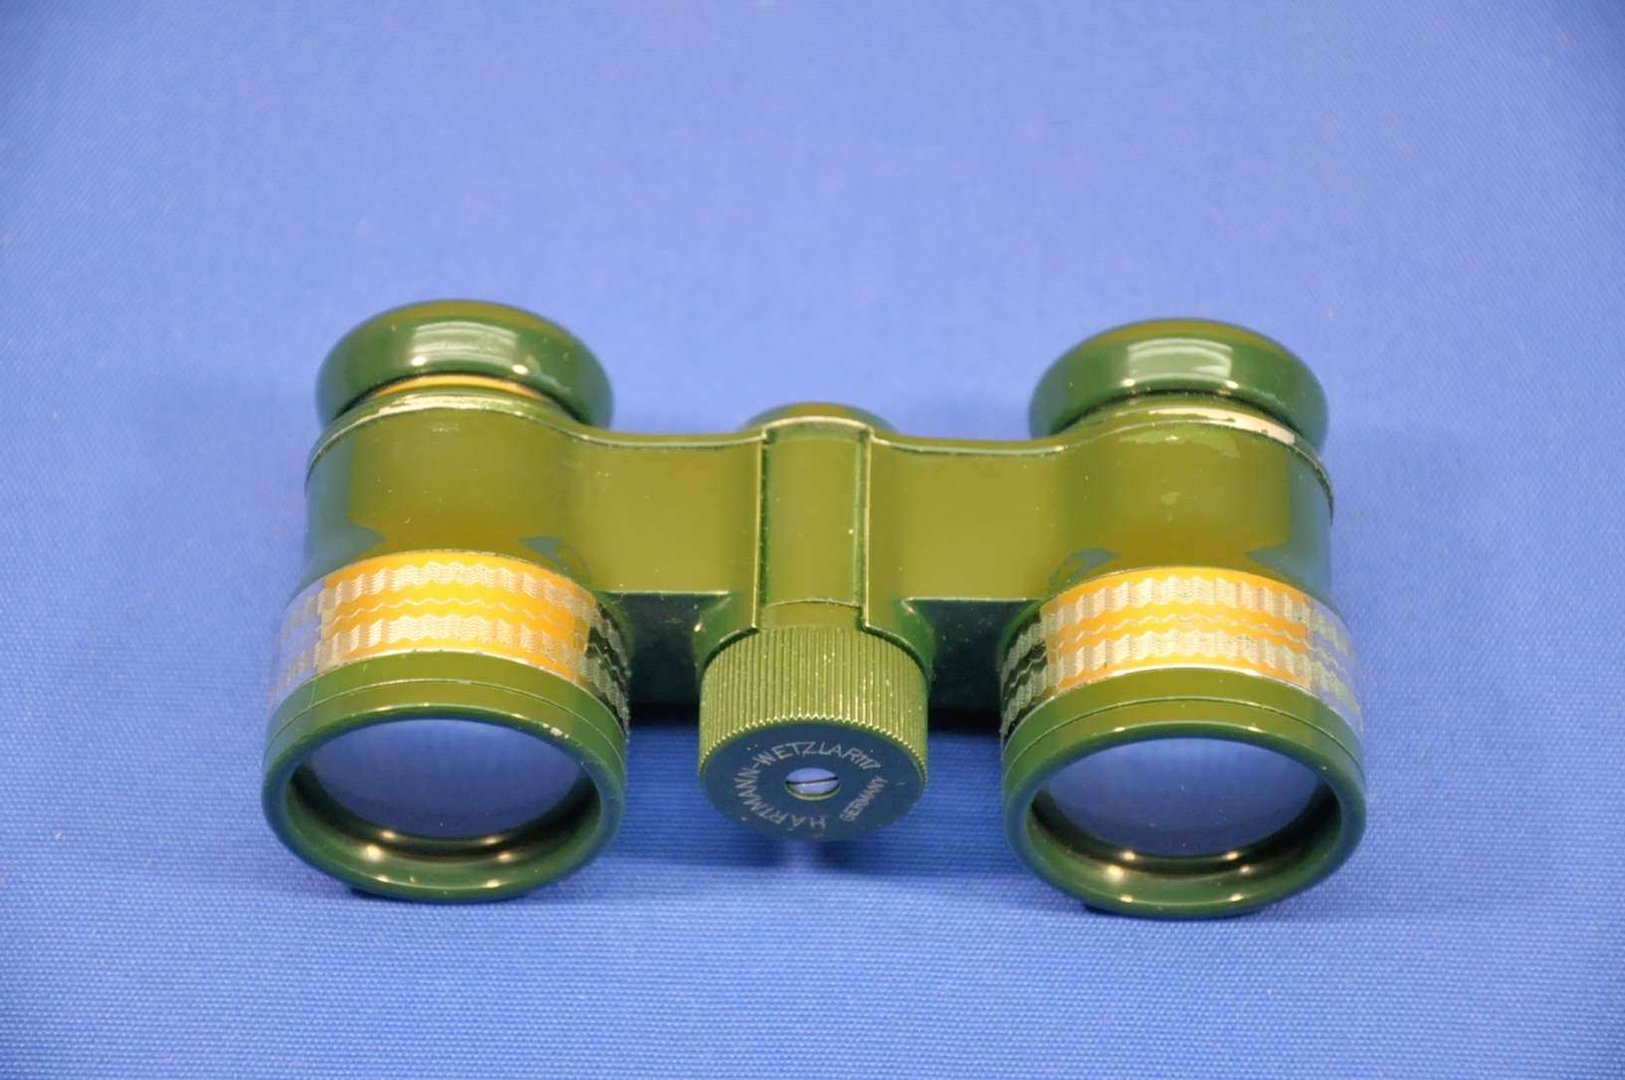 opera glasses binoculars gilda hartmann wetzlar 3x30 kusera. Black Bedroom Furniture Sets. Home Design Ideas